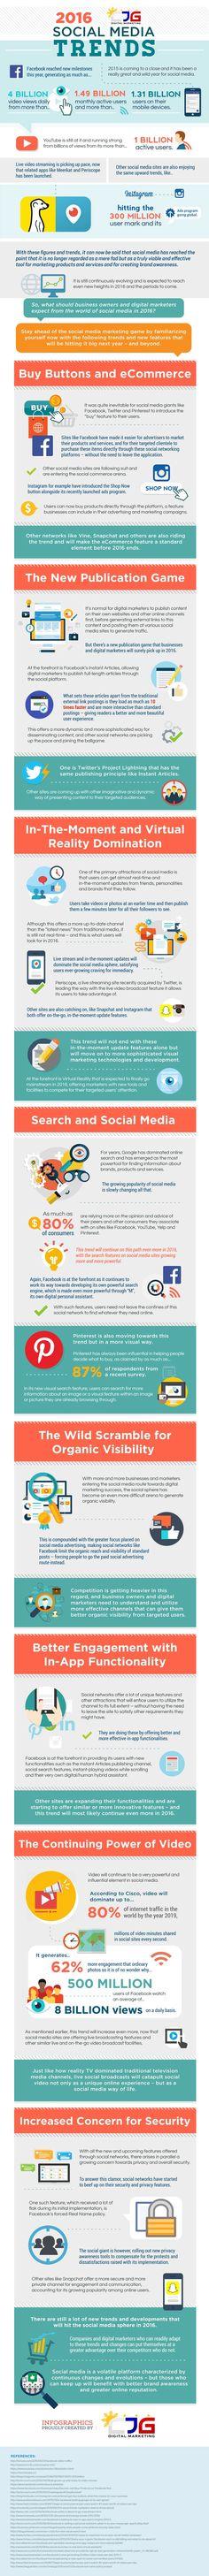 Social Media Marketing Trends 2016: Insights & Predictions - #infographic #radicalmarketing